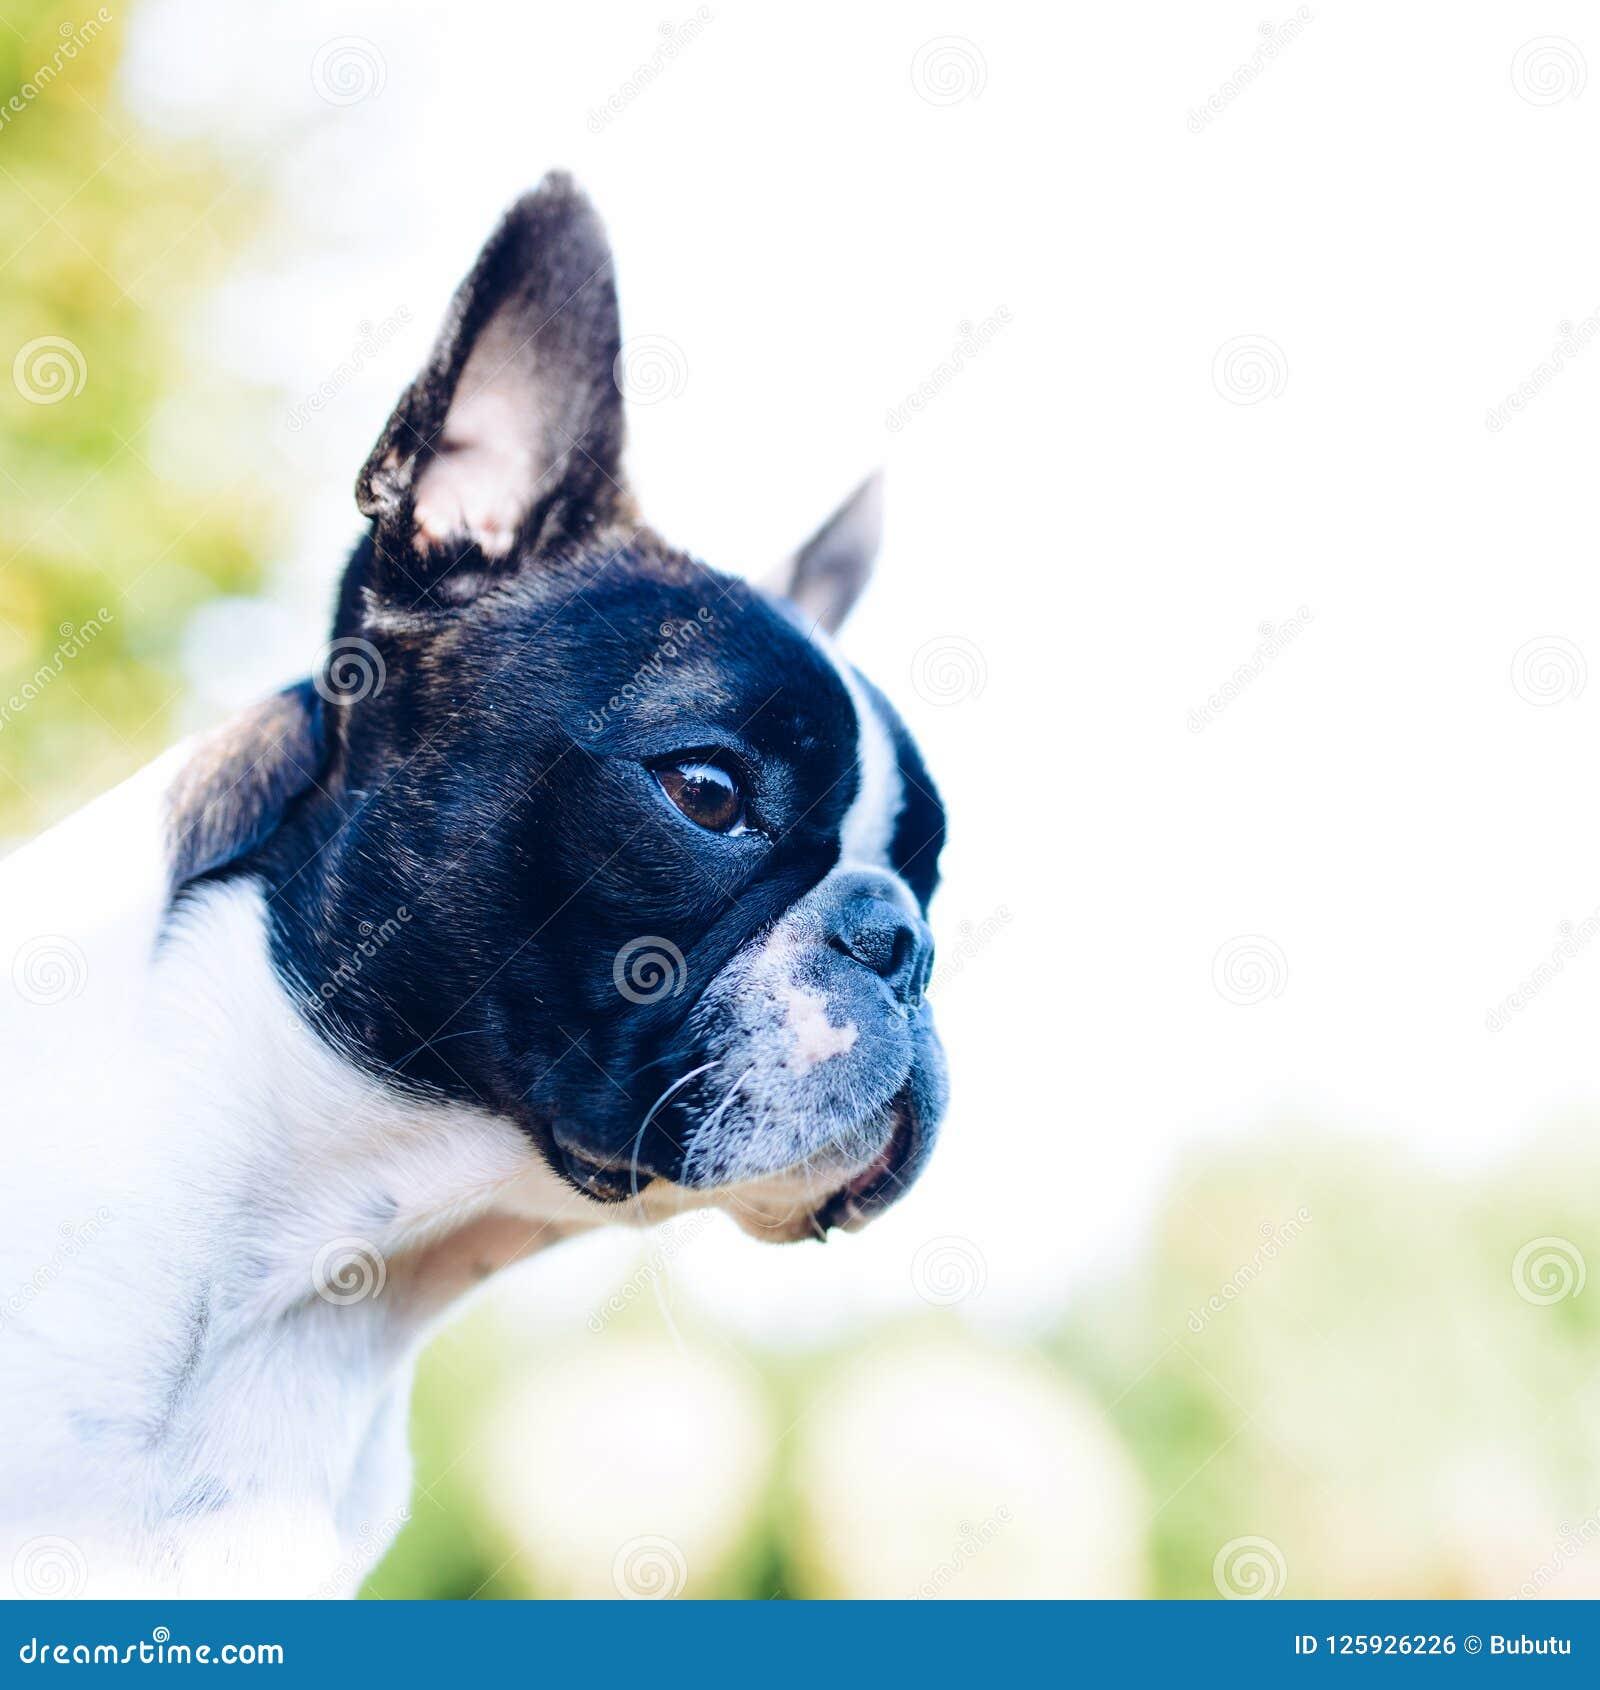 Boston terrier dog on summer background